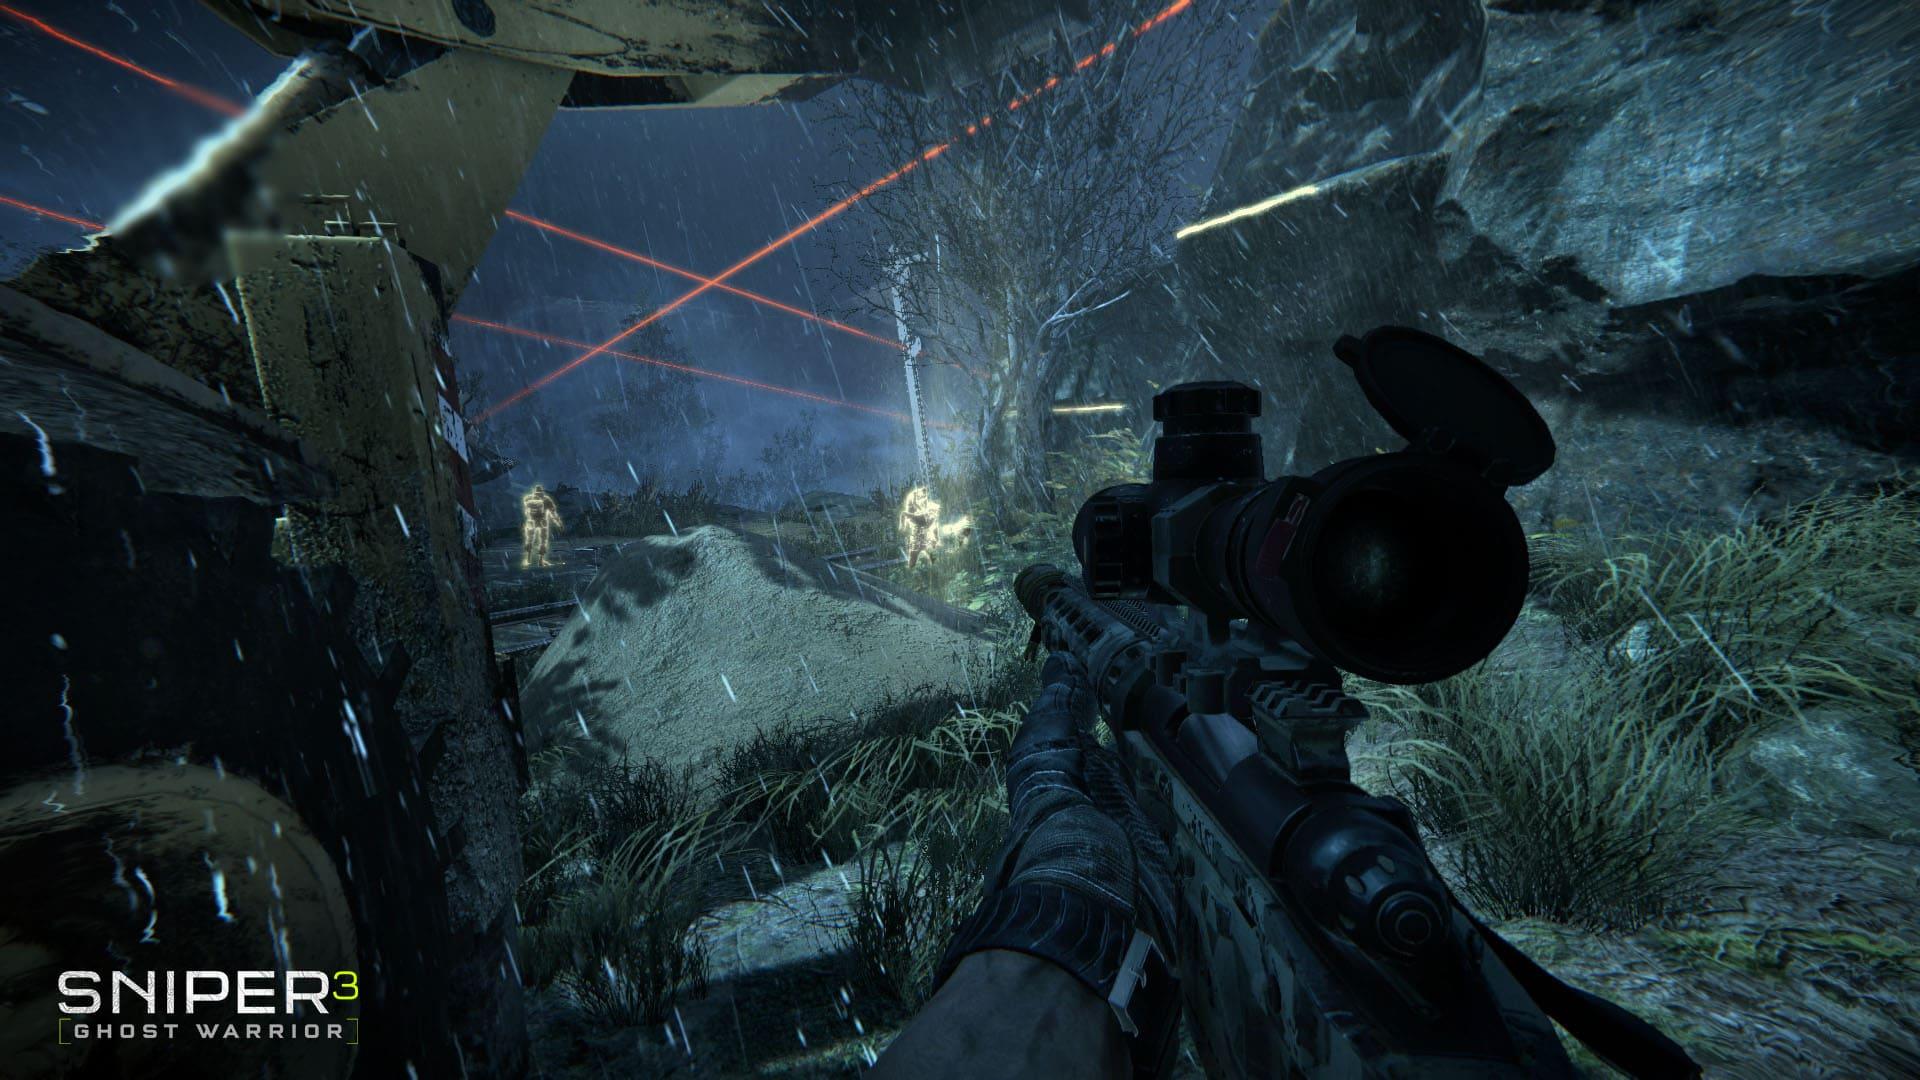 Sniper Ghost Warrior 3 Wallpaper Download (23 In 1 Pack